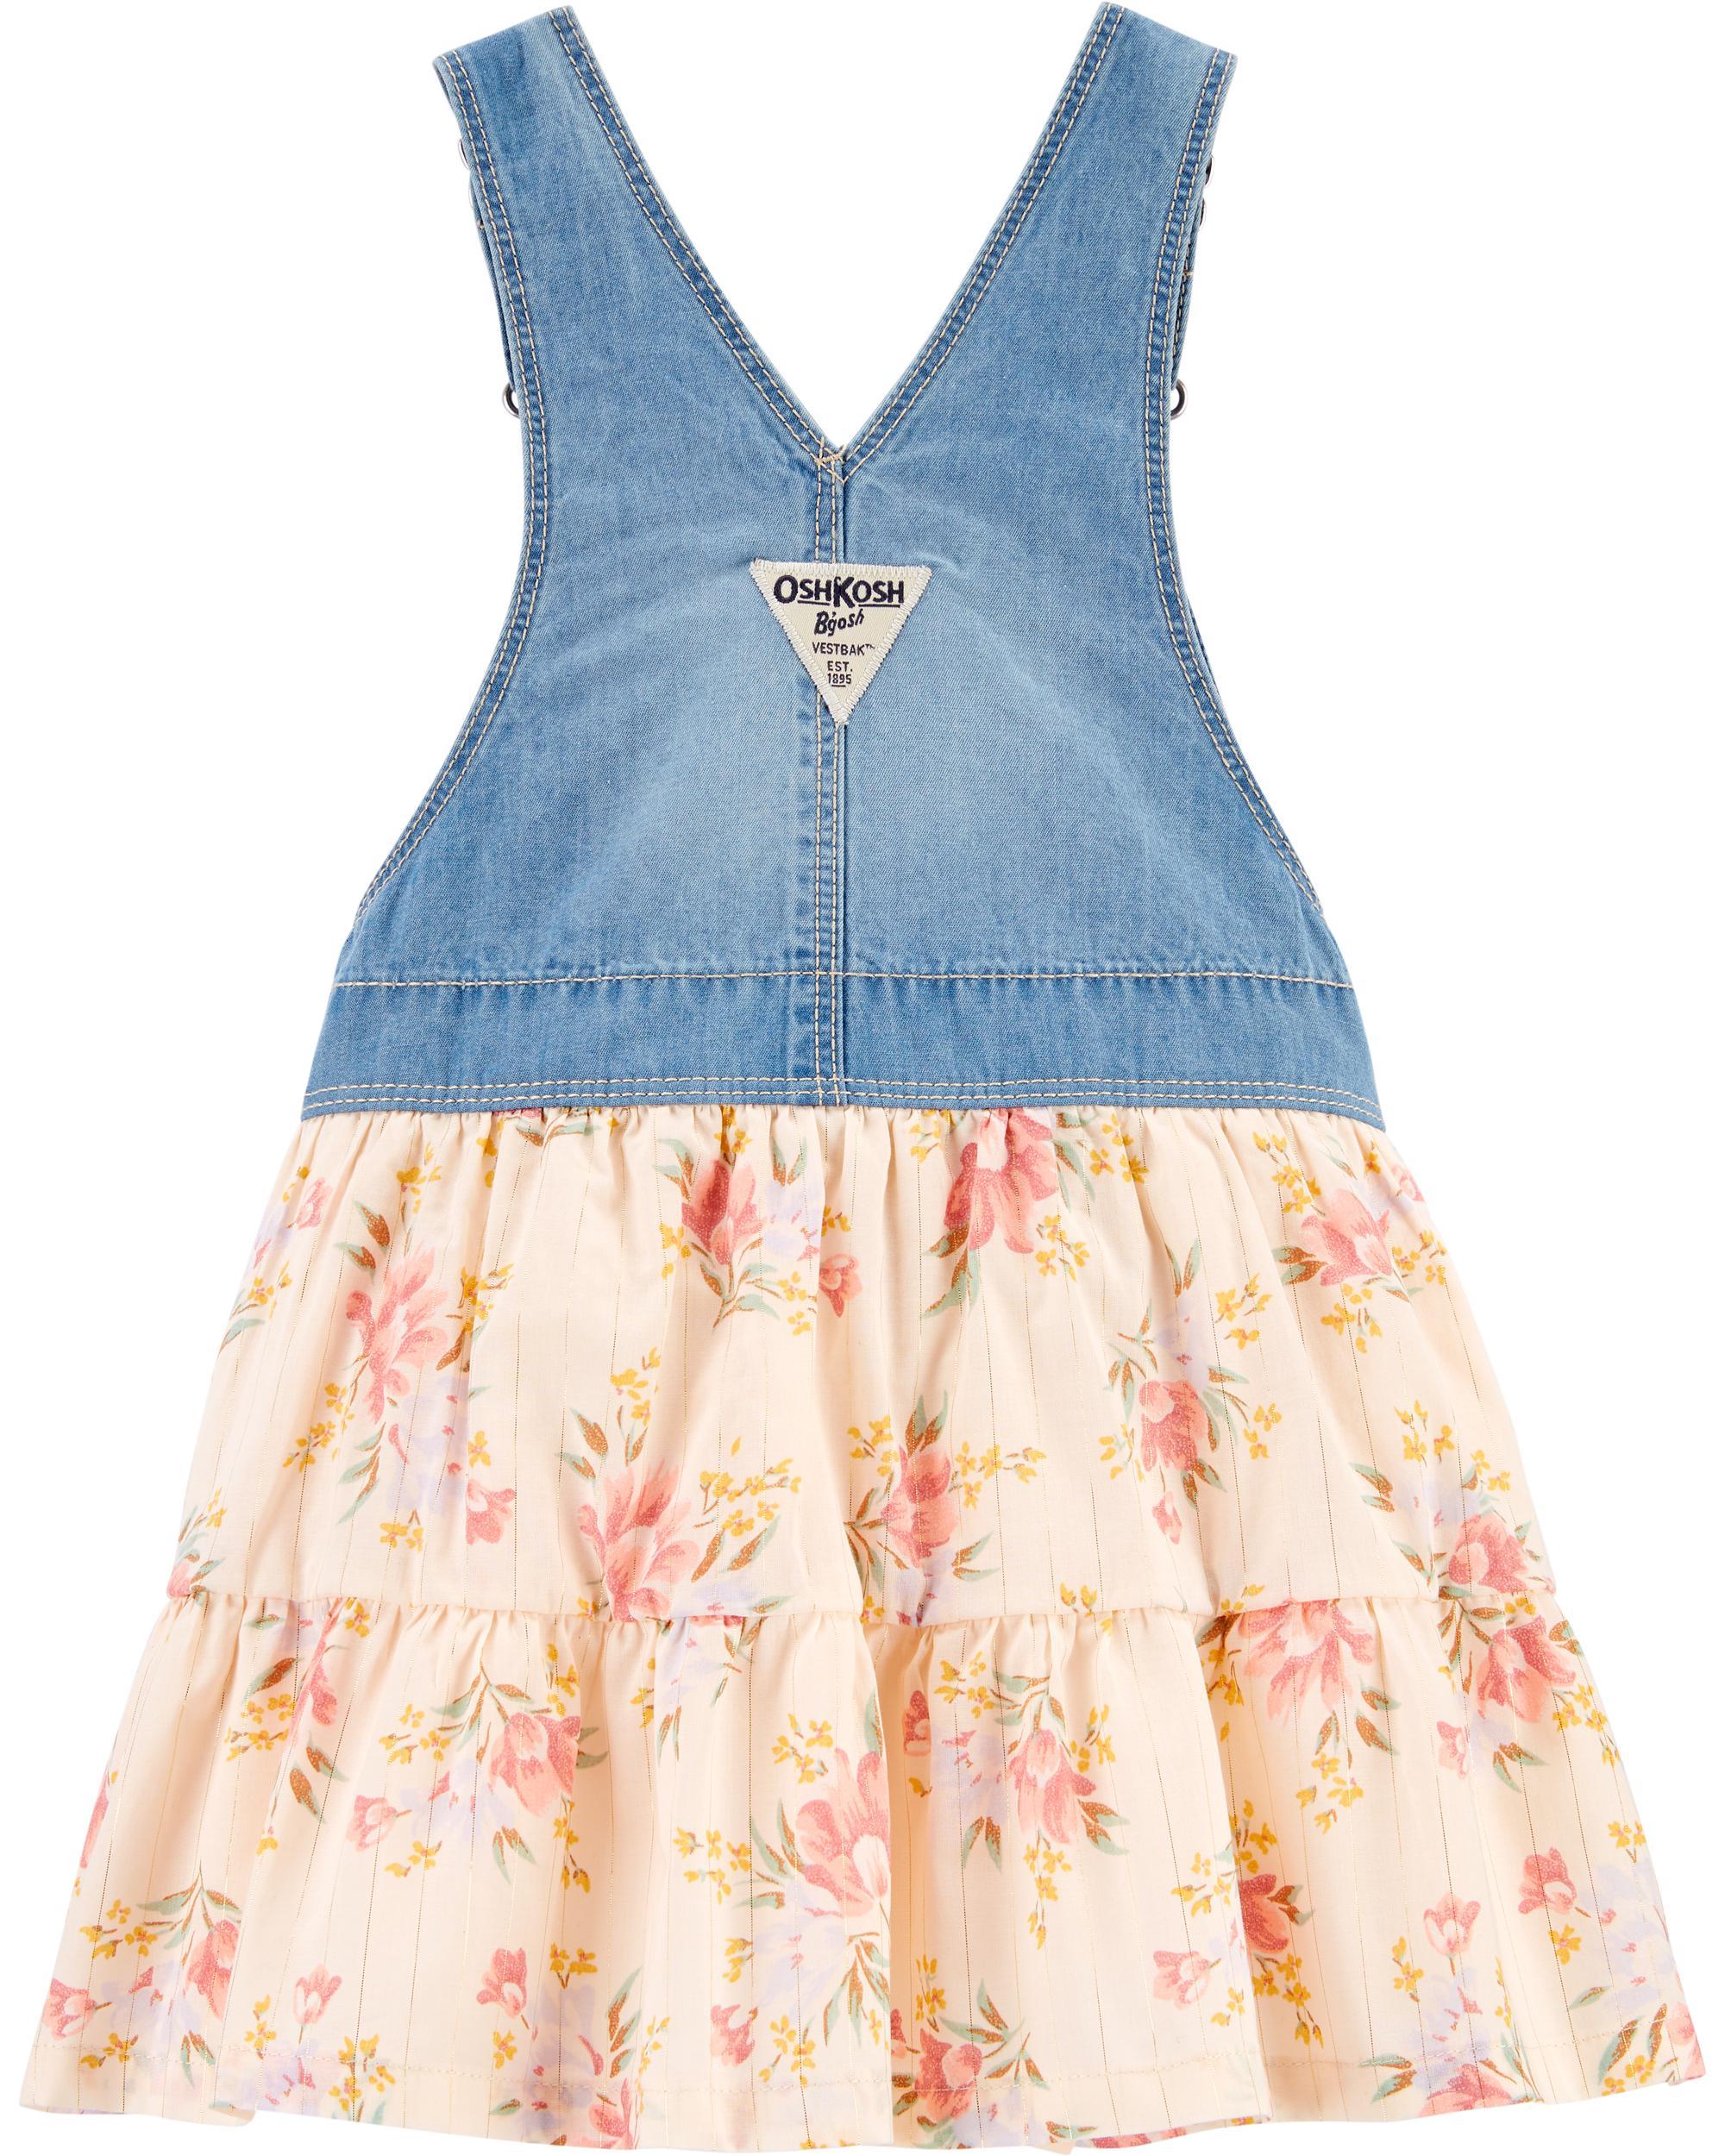 Girl Jumper Baby Jumper Kenzer  Jumper Blue Floral Mix-match Jumper